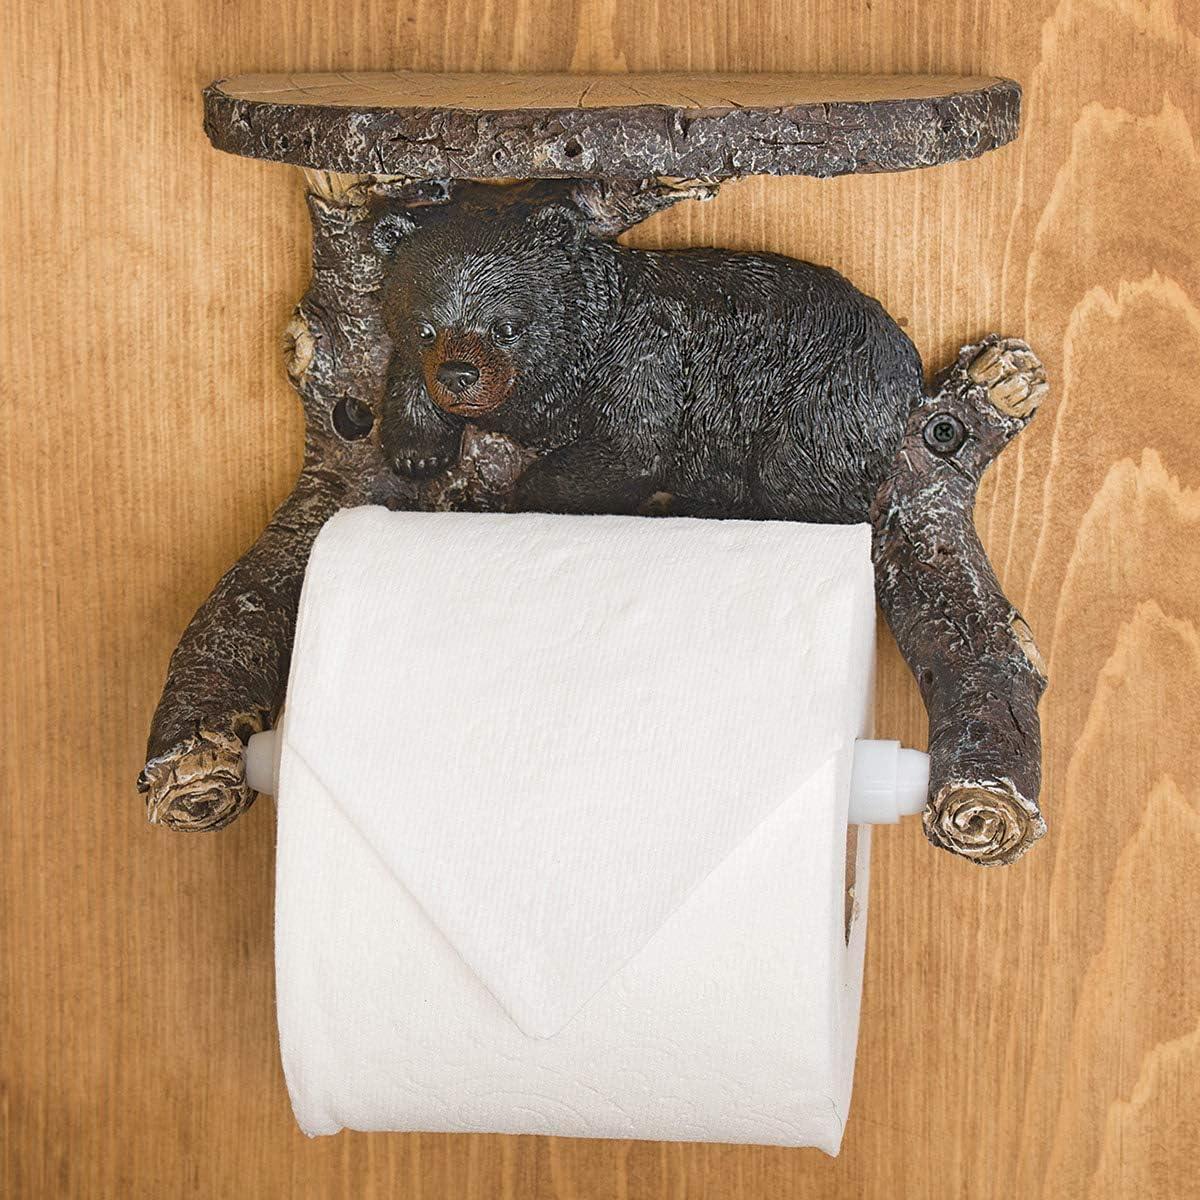 BLACK FOREST Purchase DECOR Sleepy Ranking TOP14 Bear Holder Shelf Toilet Paper